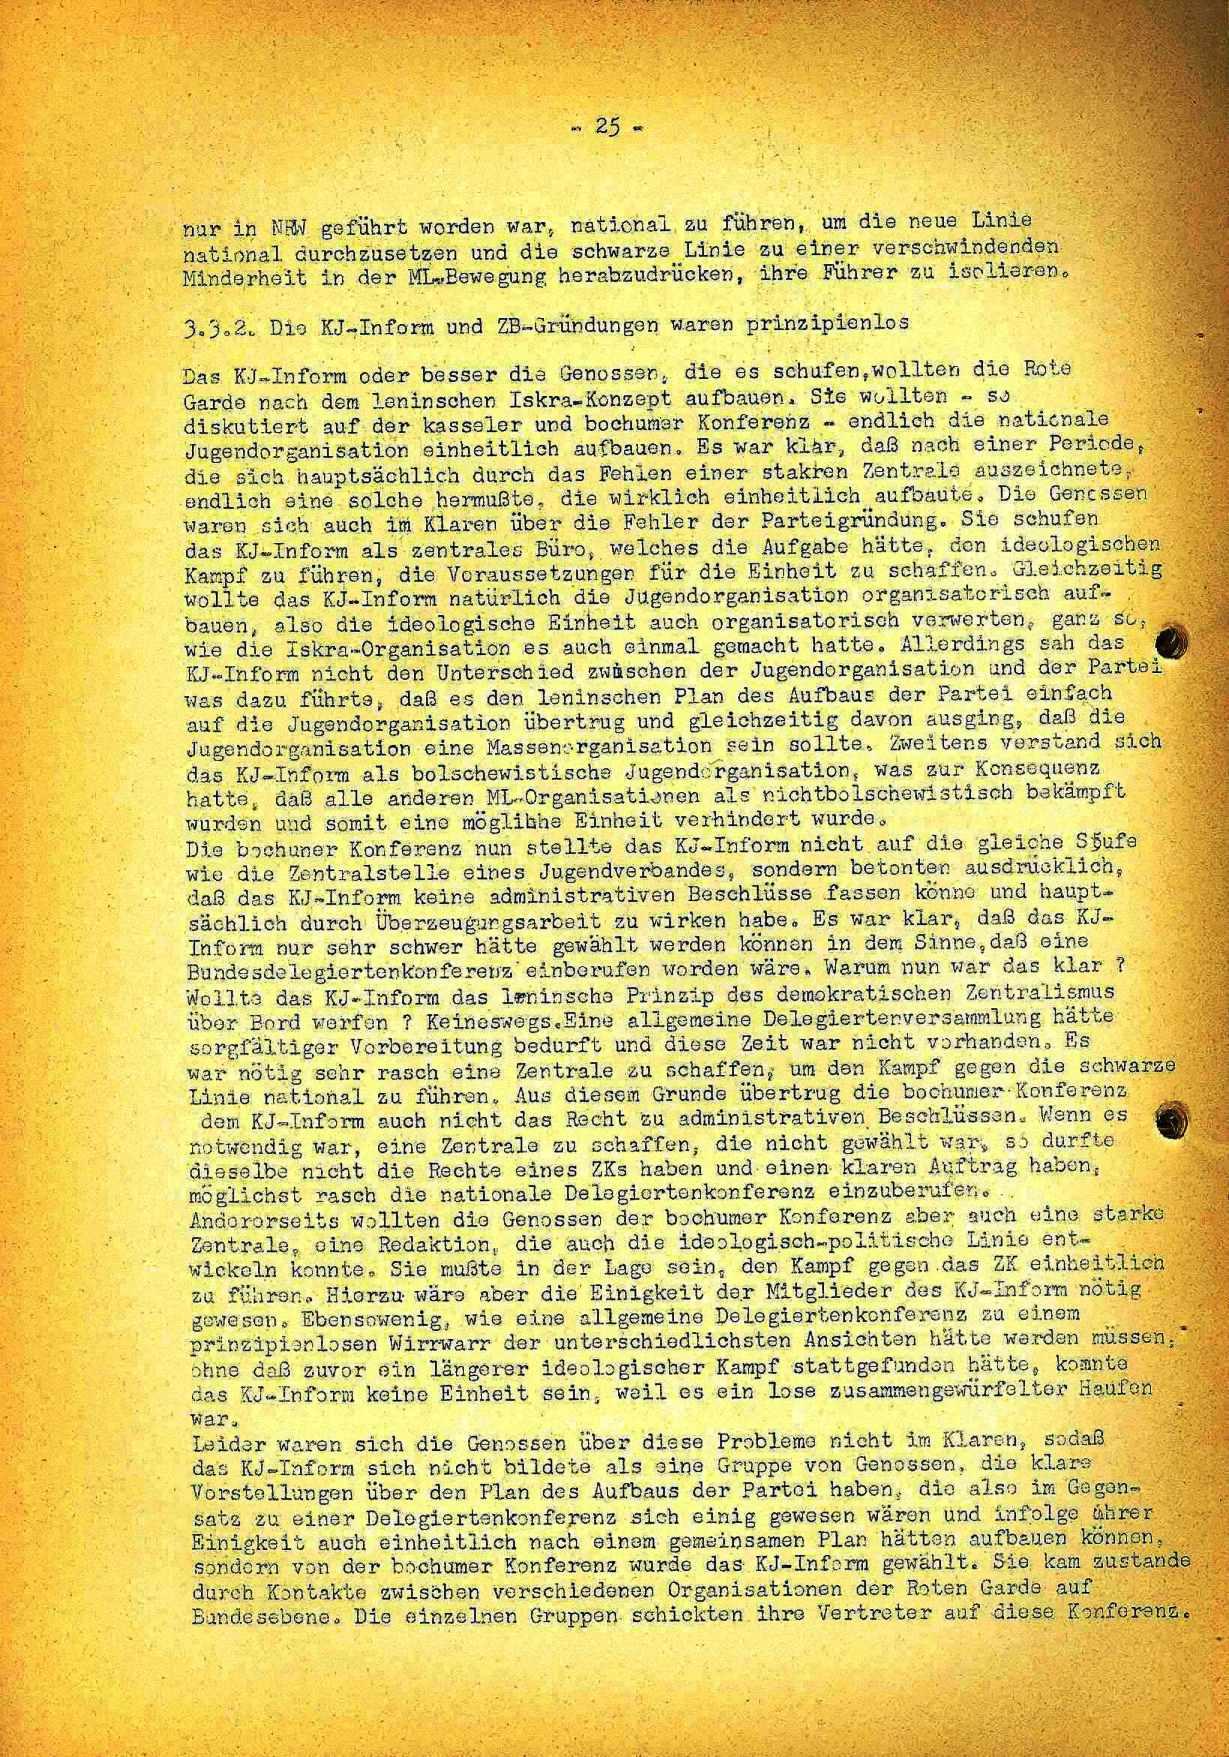 Weinfurth025